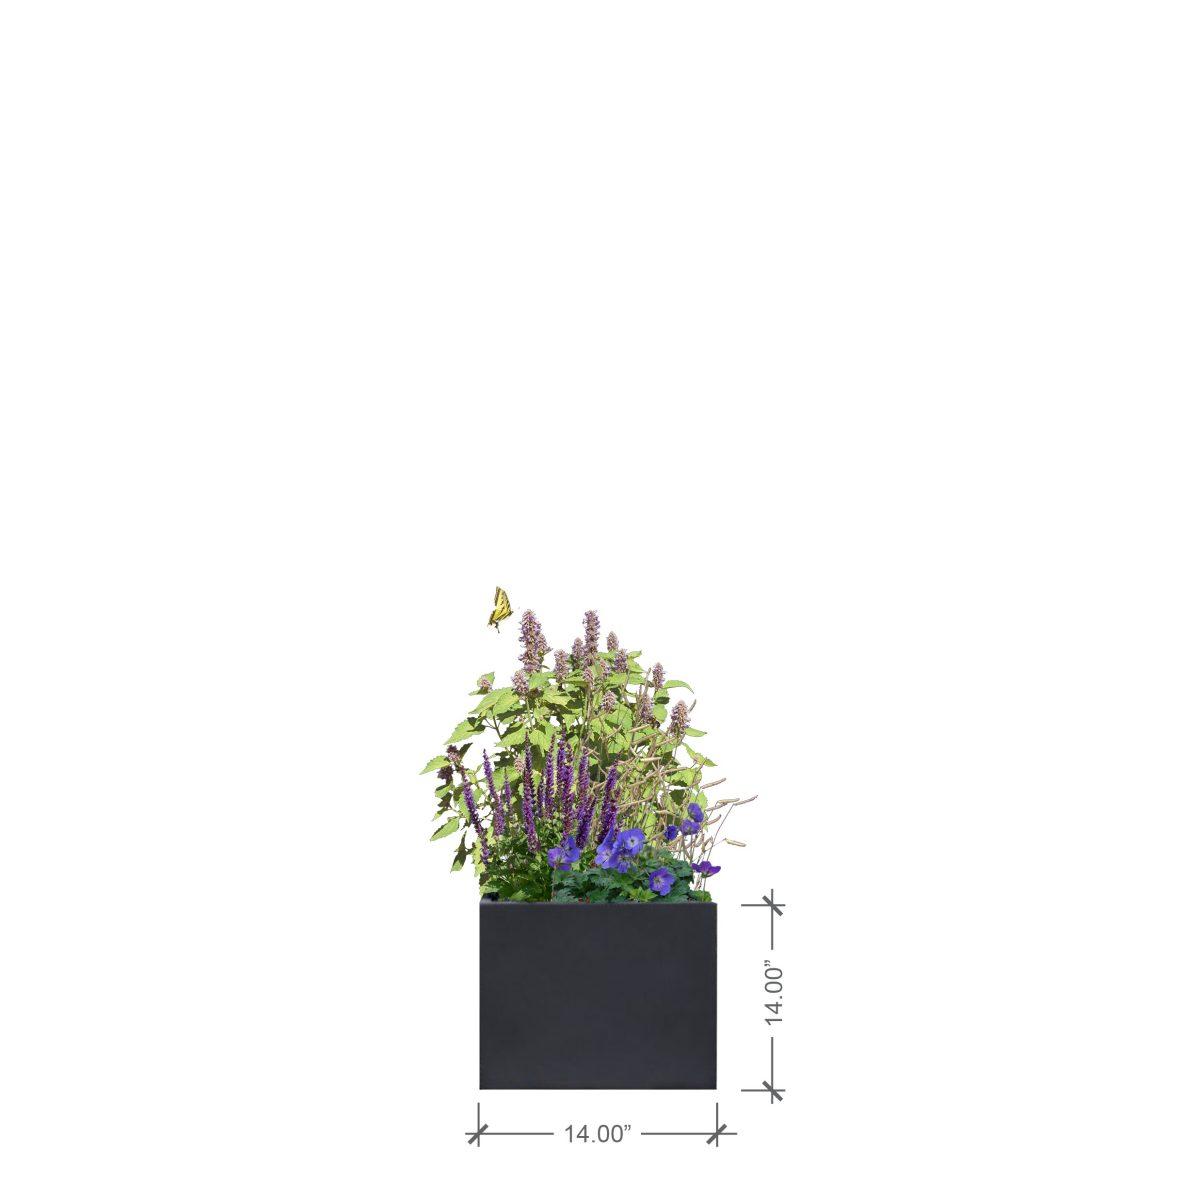 Small Lead Square Planter, BLOOMTIME